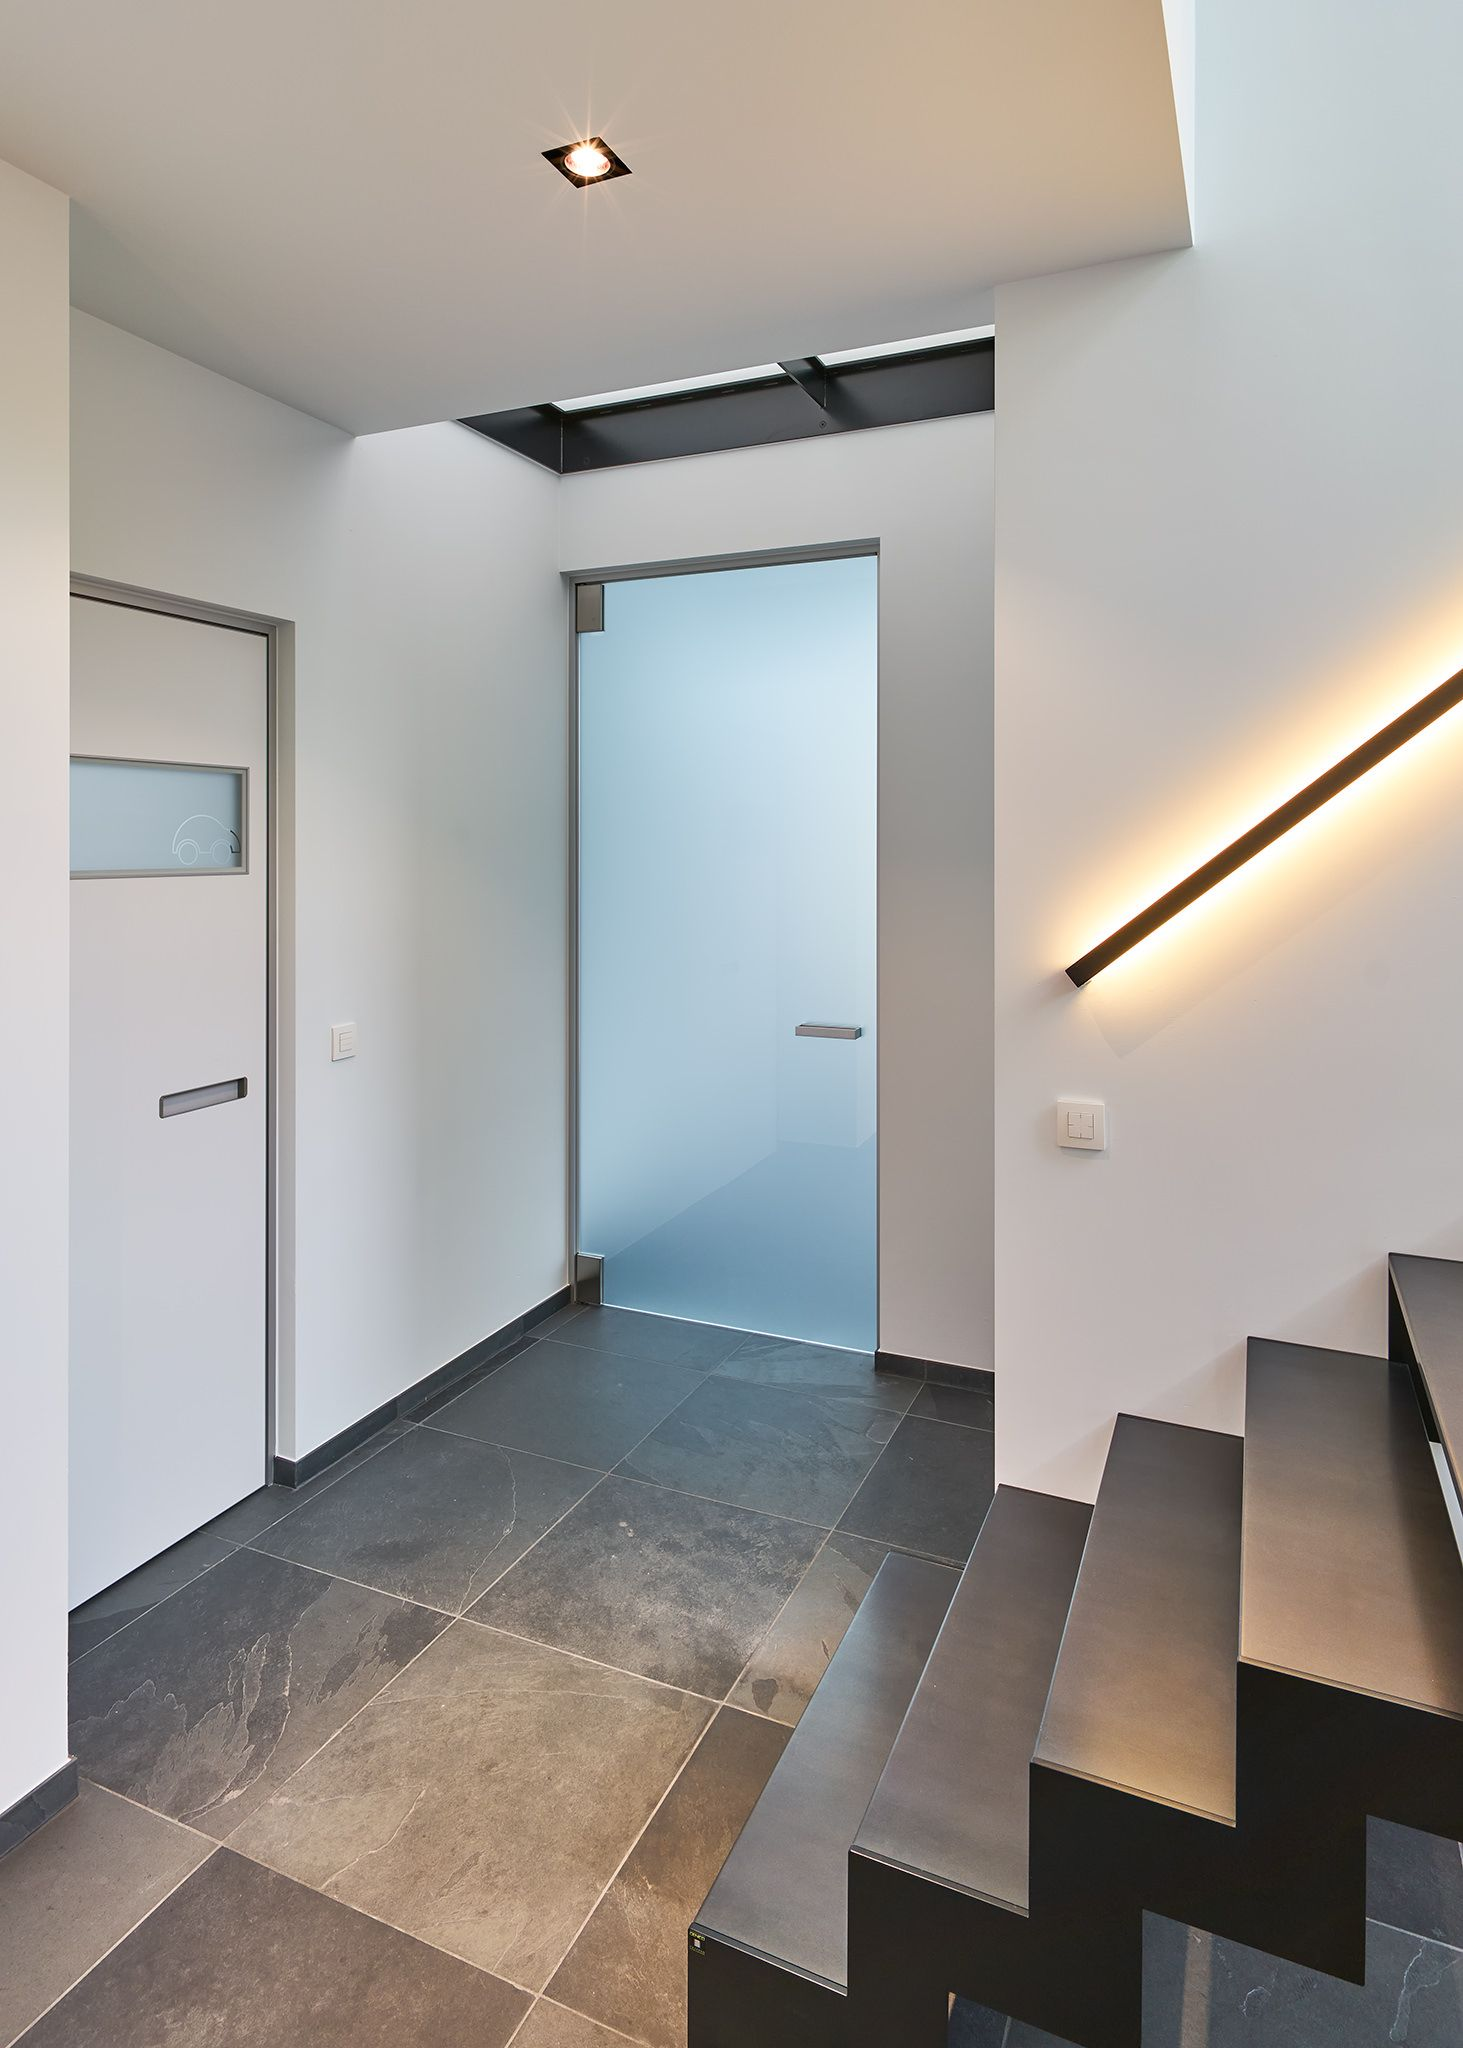 Plain White Interior Doors custom-made interior doors. both modern doors feature the same